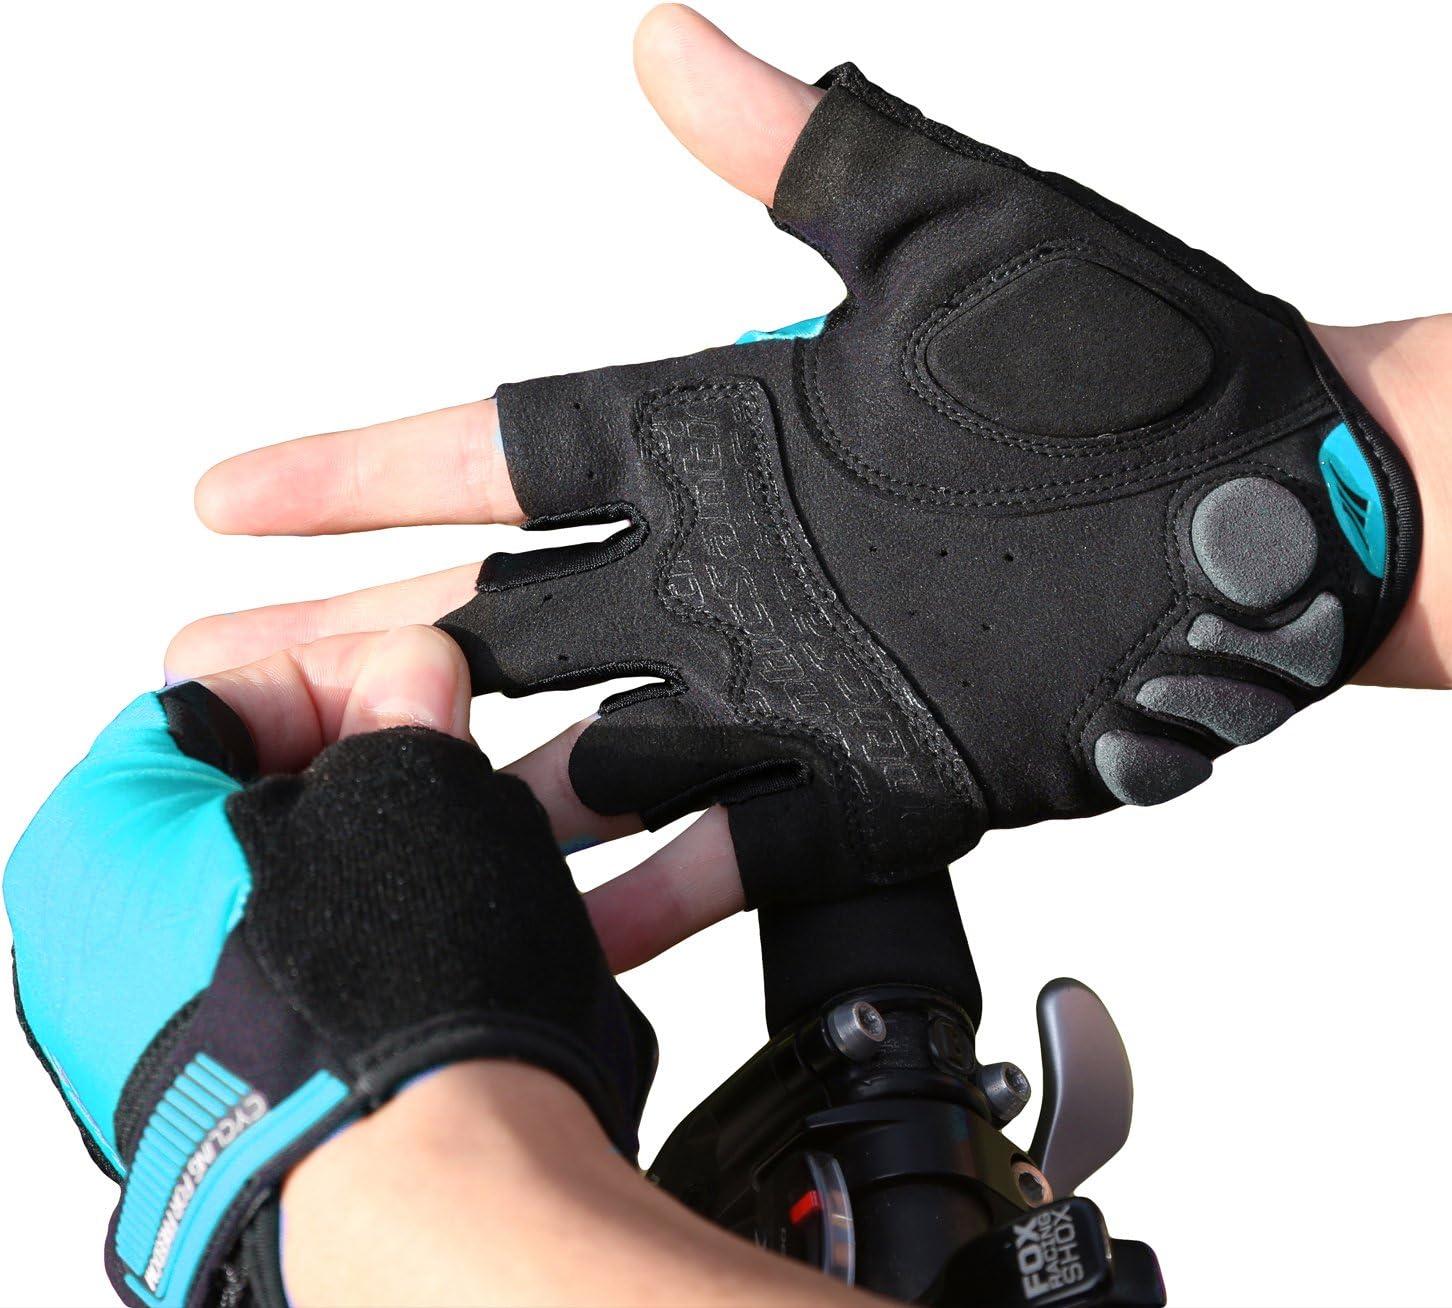 Santic Fahrradhandschuhe M/änner Sommer Halbfinger Handschuhe Damen Radsport Radhandschuhe Handschuhe Fahrrad Gepolstert